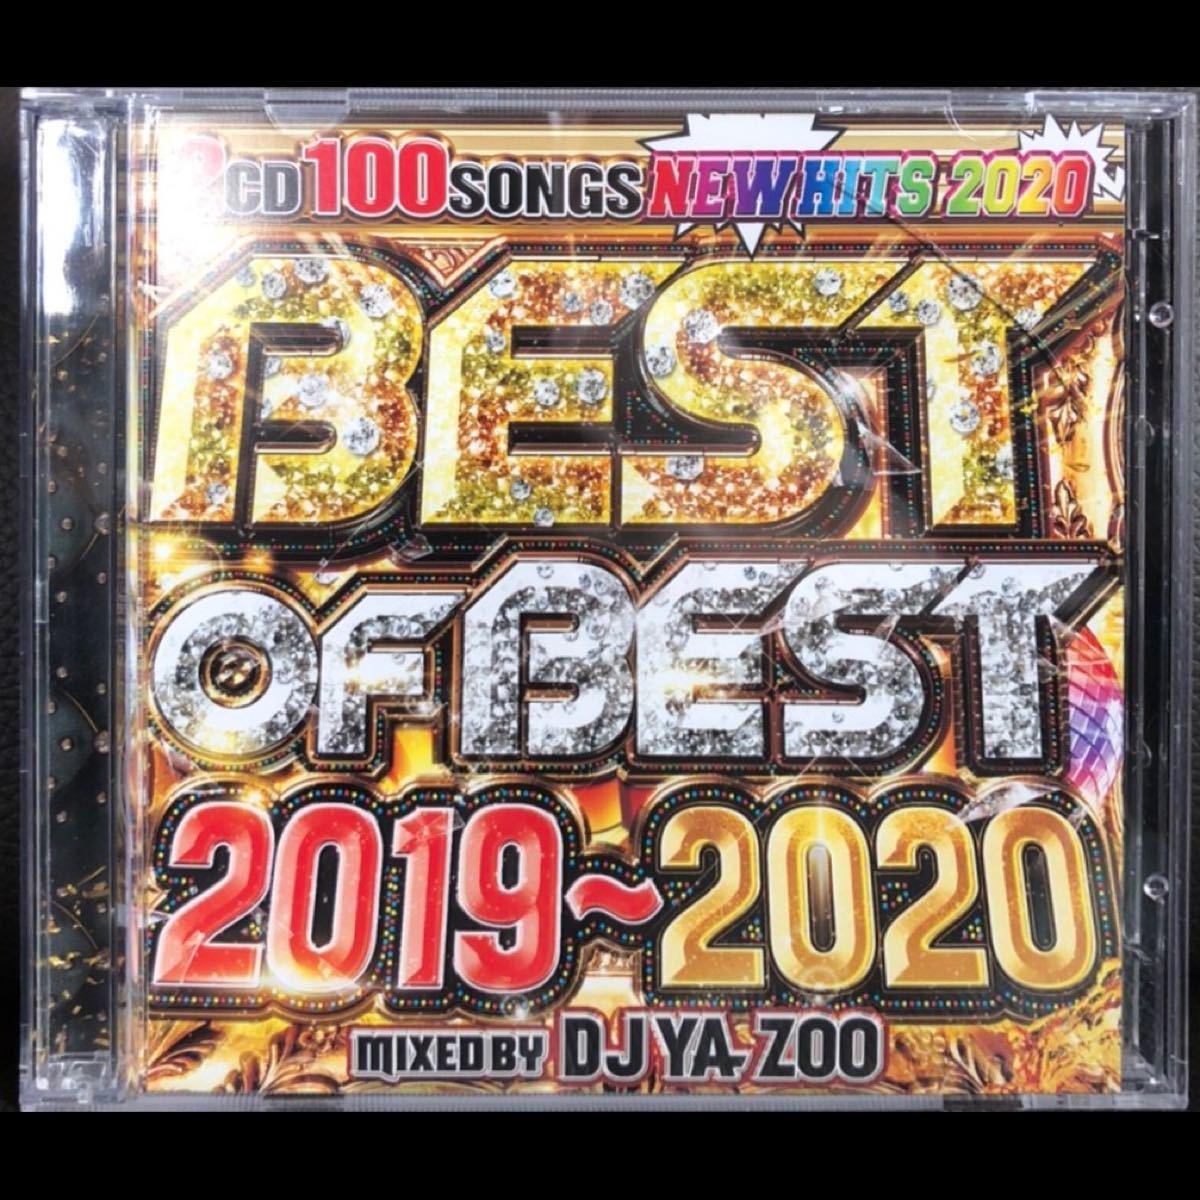 洋楽CD Best Of Best 2019-2020